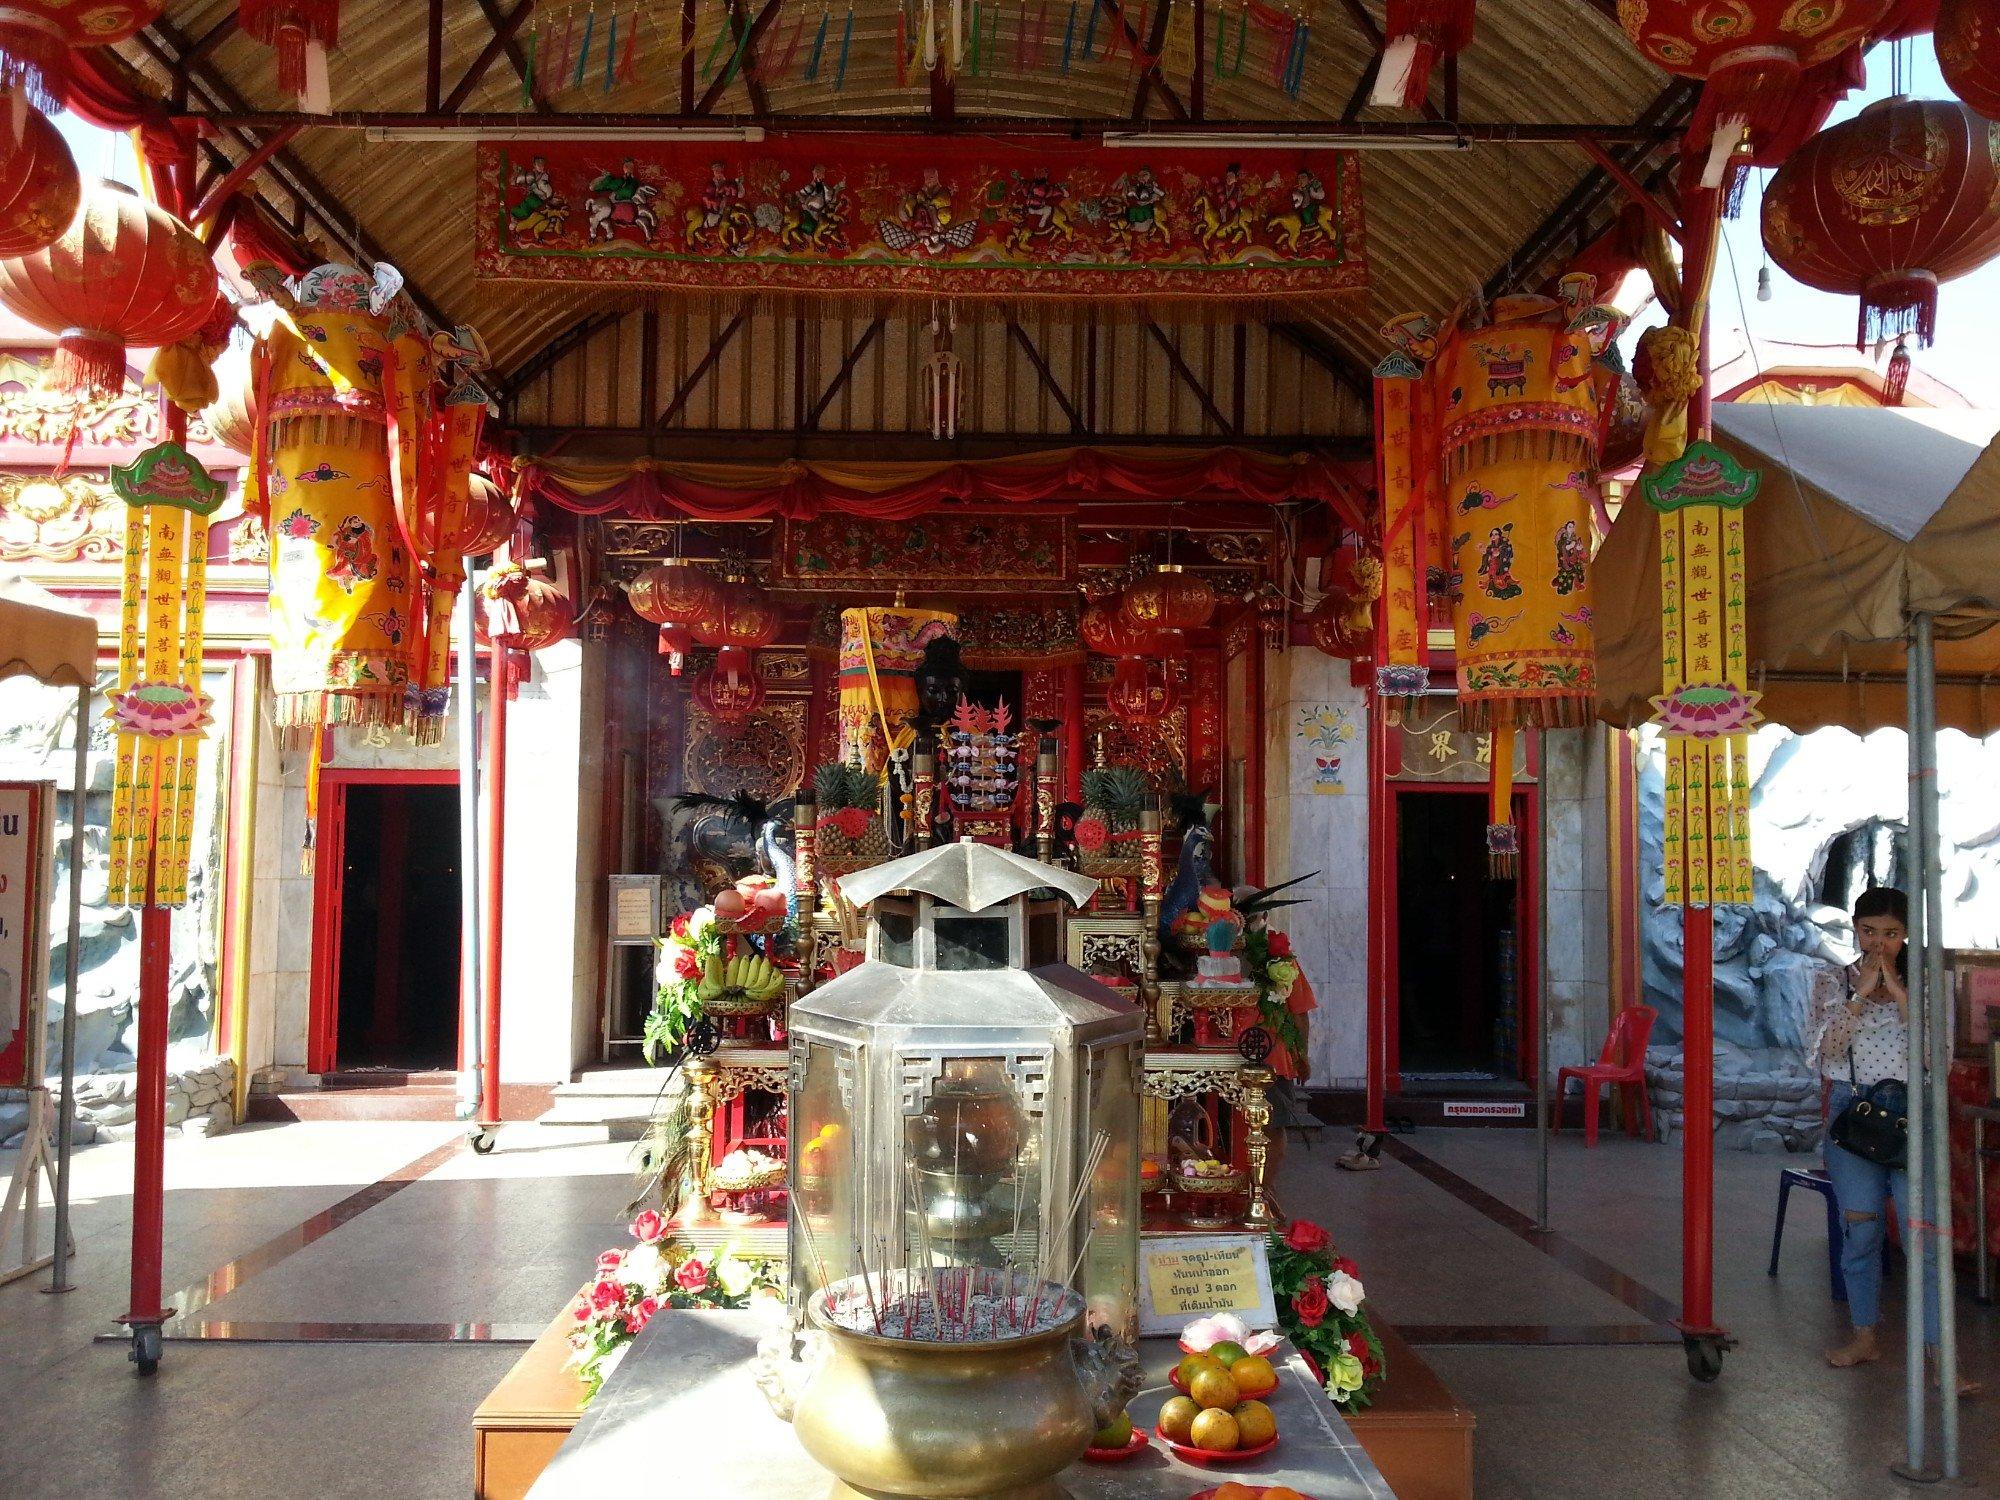 Courtyard leading to the Put Cho Shrine